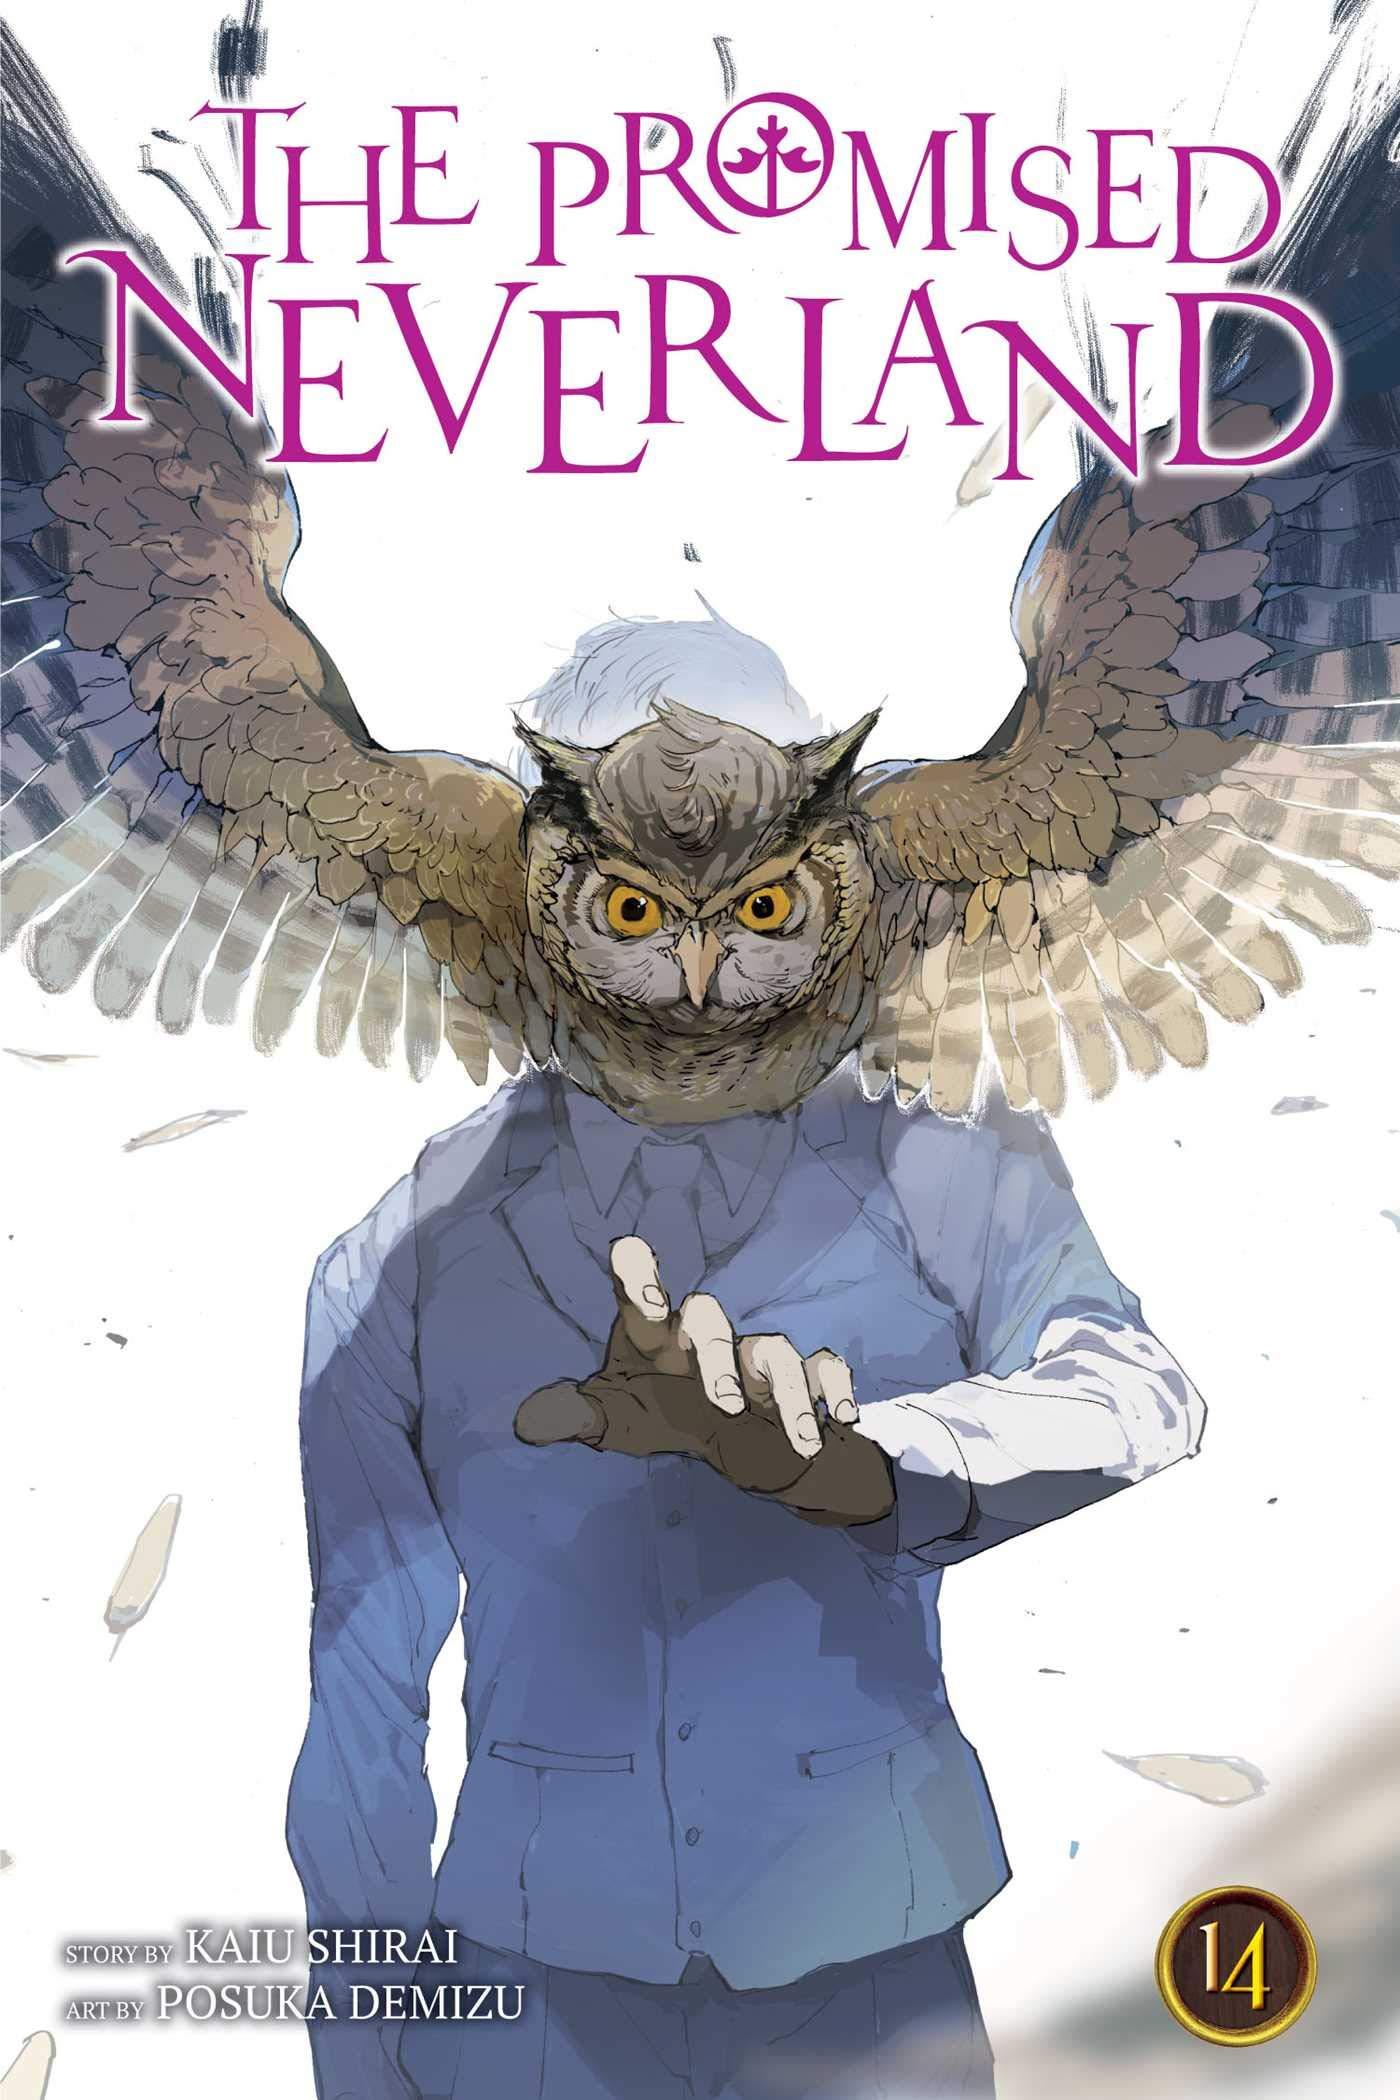 Amazon.fr - The Promised Neverland, Vol. 14 - Shirai, Kaiu, Demizu, Posuka - Livres